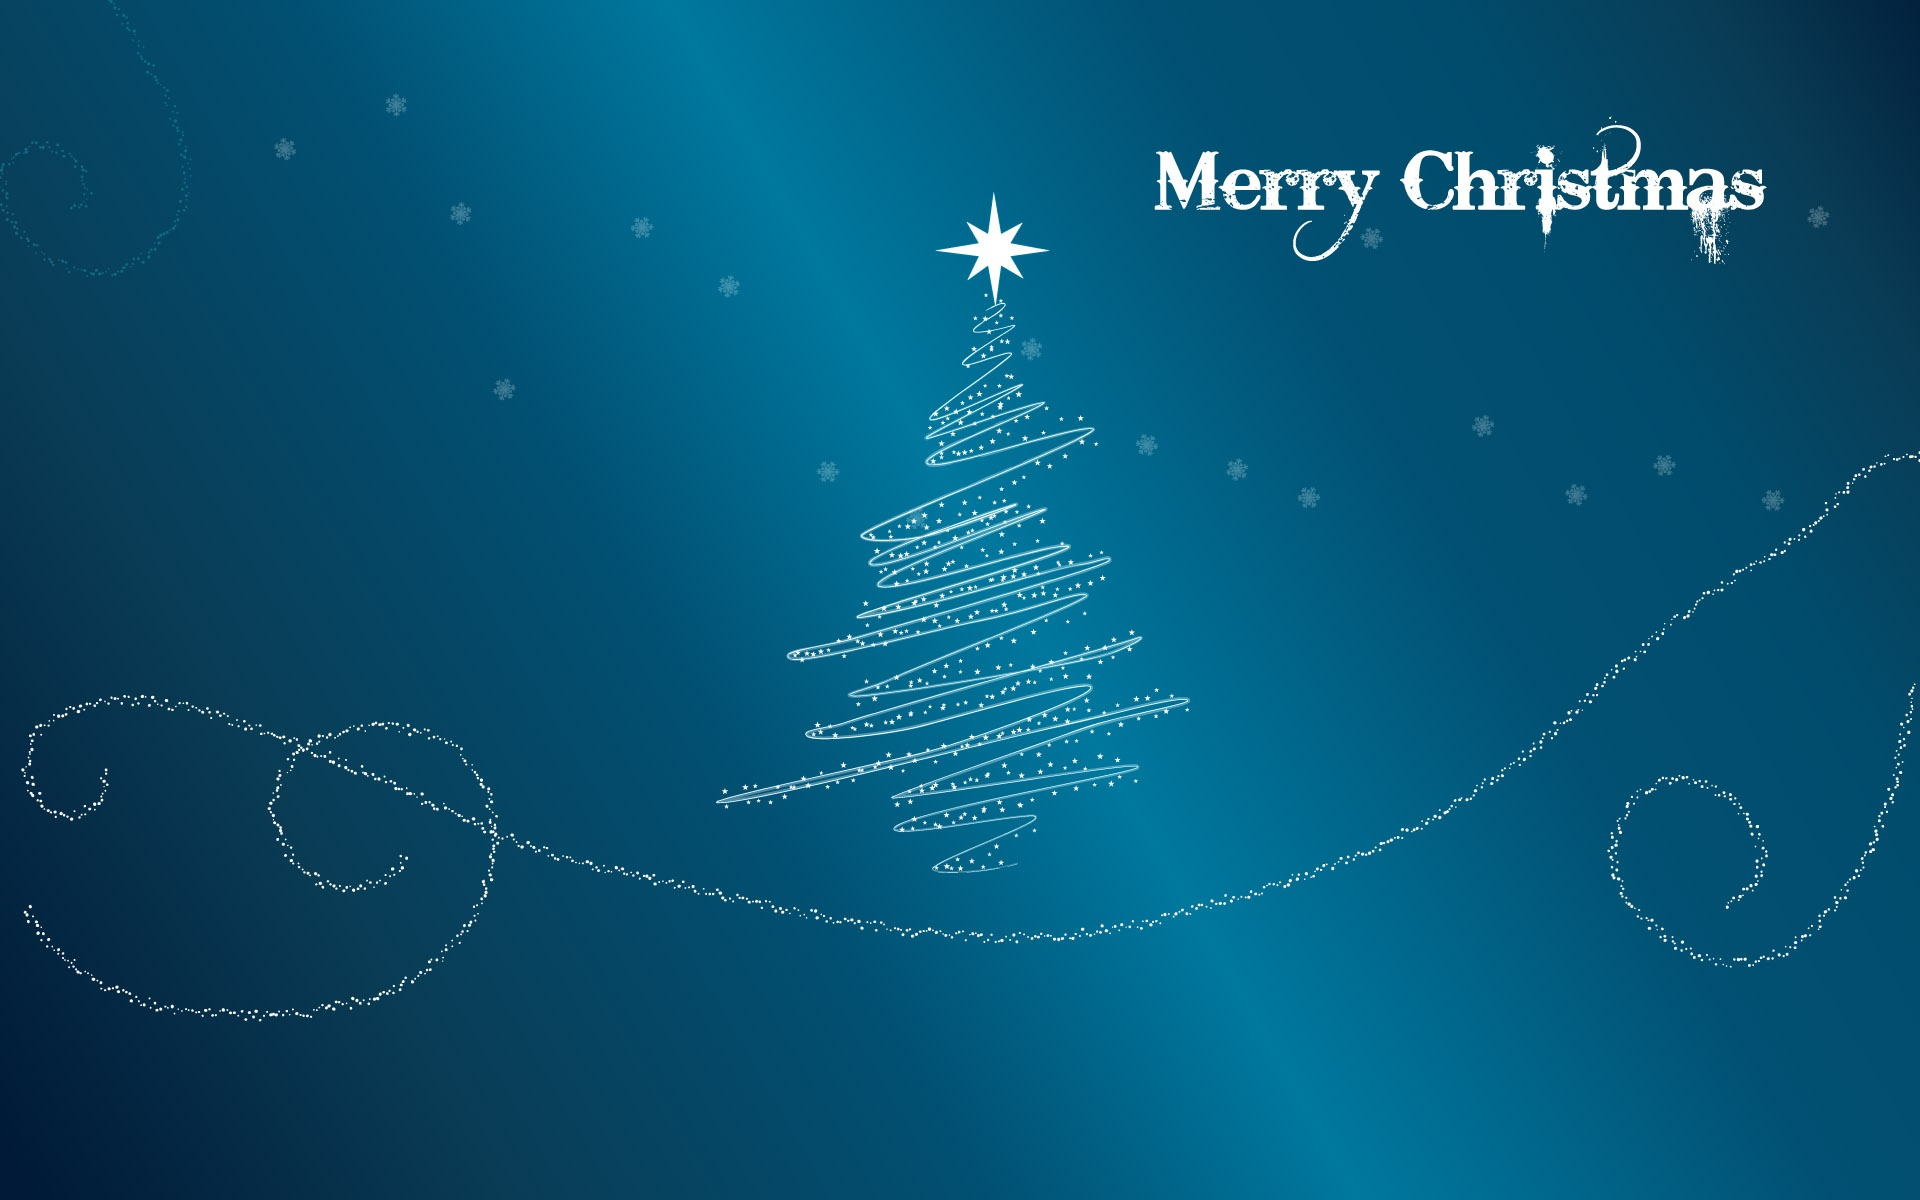 http://www.turnbacktogod.com/wp-content/uploads/2010/11/Merry-Christmas-Wallpaper.jpg